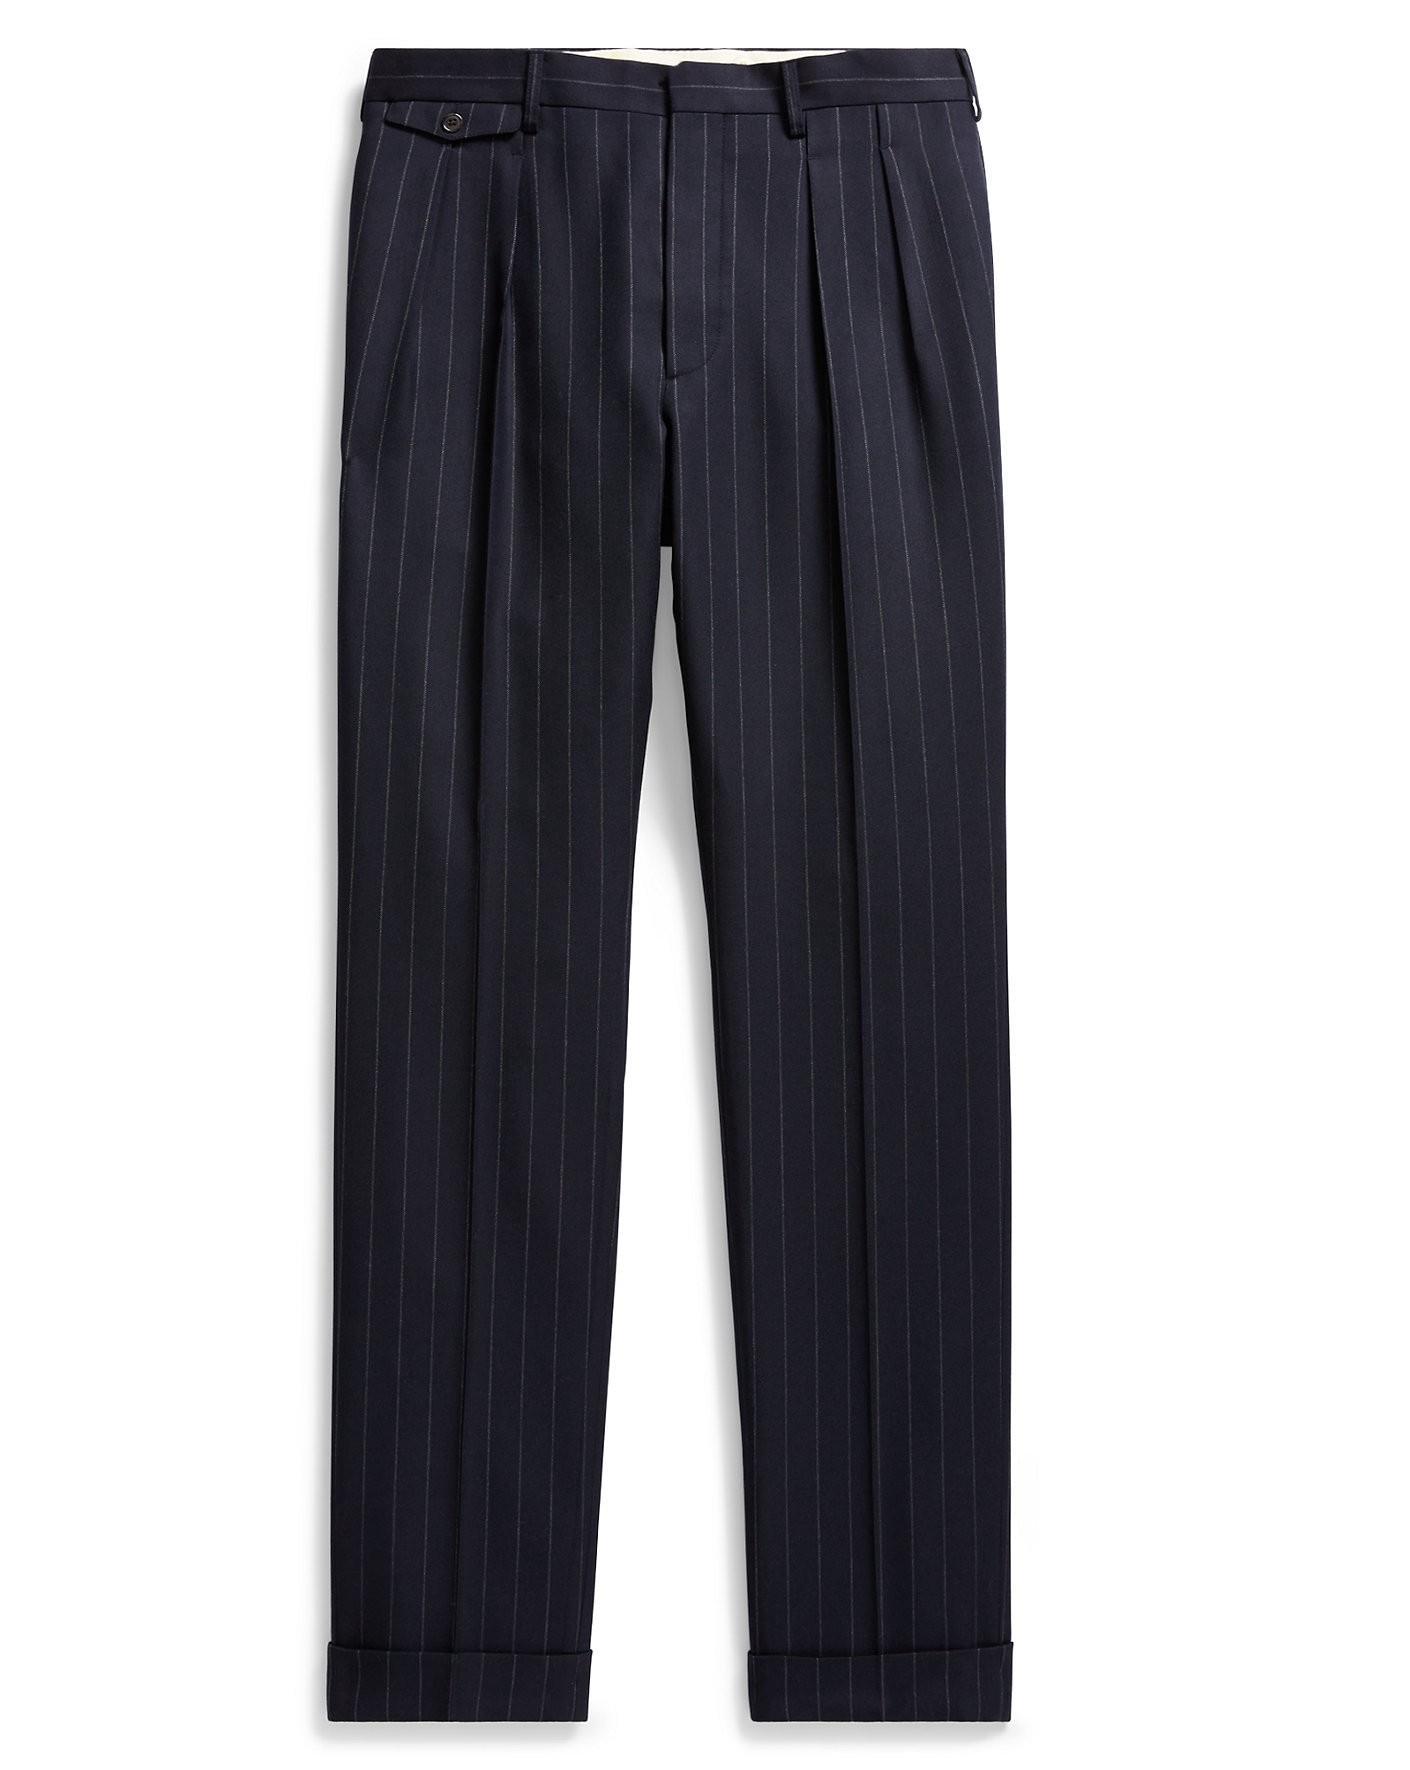 Ralph Lauren Rrl Slim Chalk-stripe Wool Trouser In Navy Blue